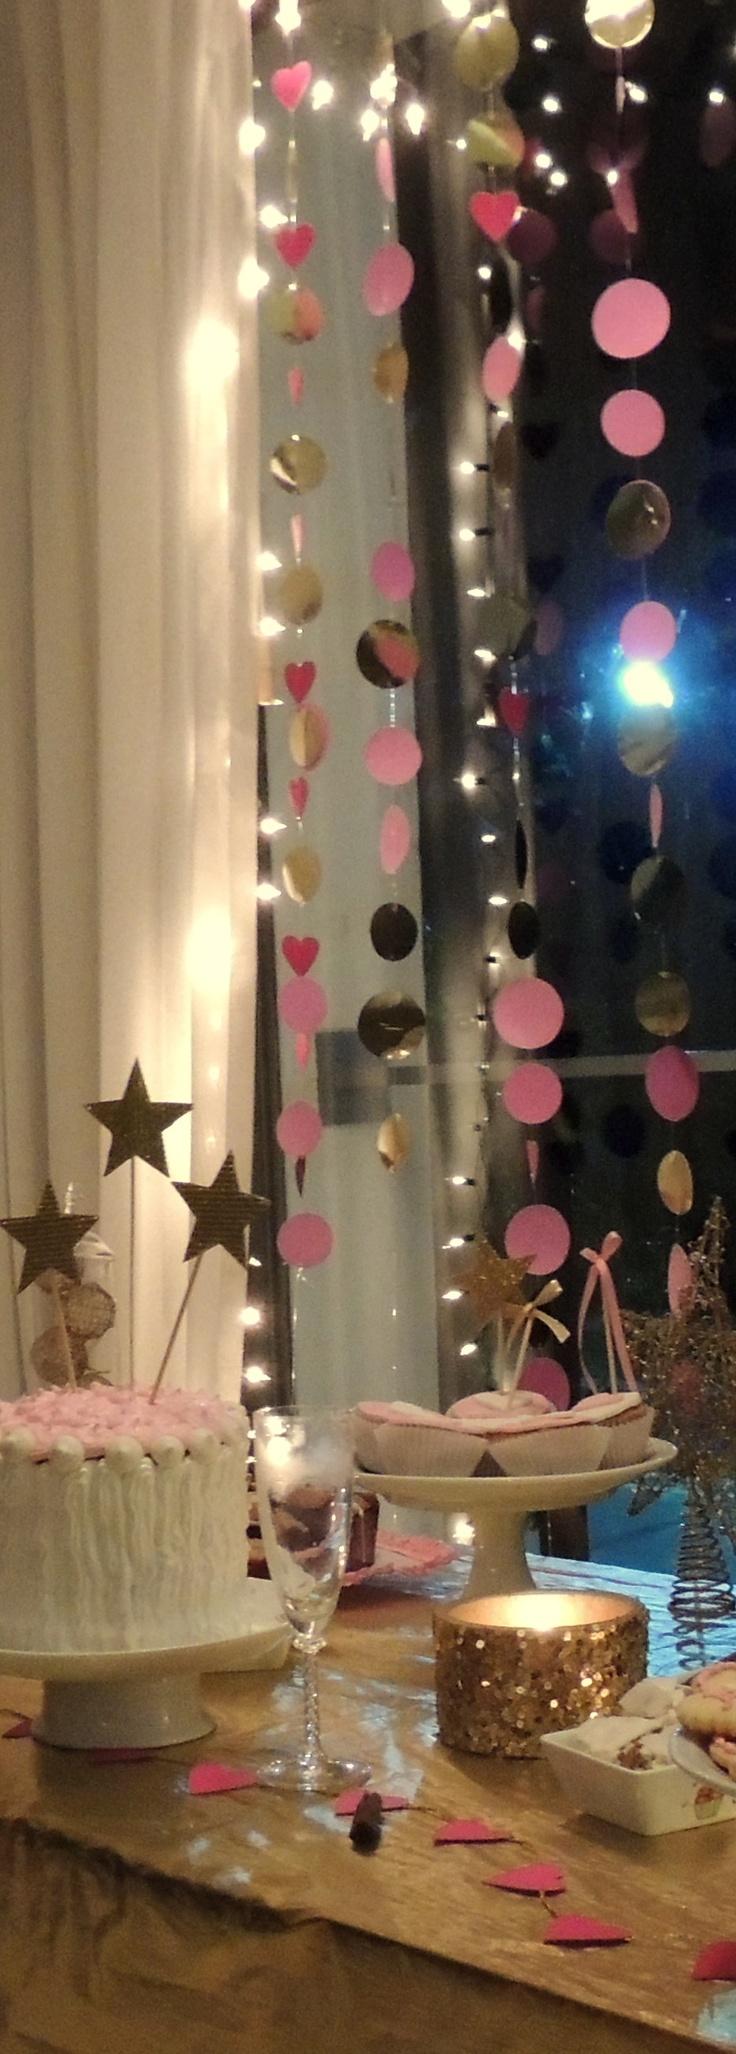 M s de 25 ideas incre bles sobre decoracion cumplea os for Decoracion 40